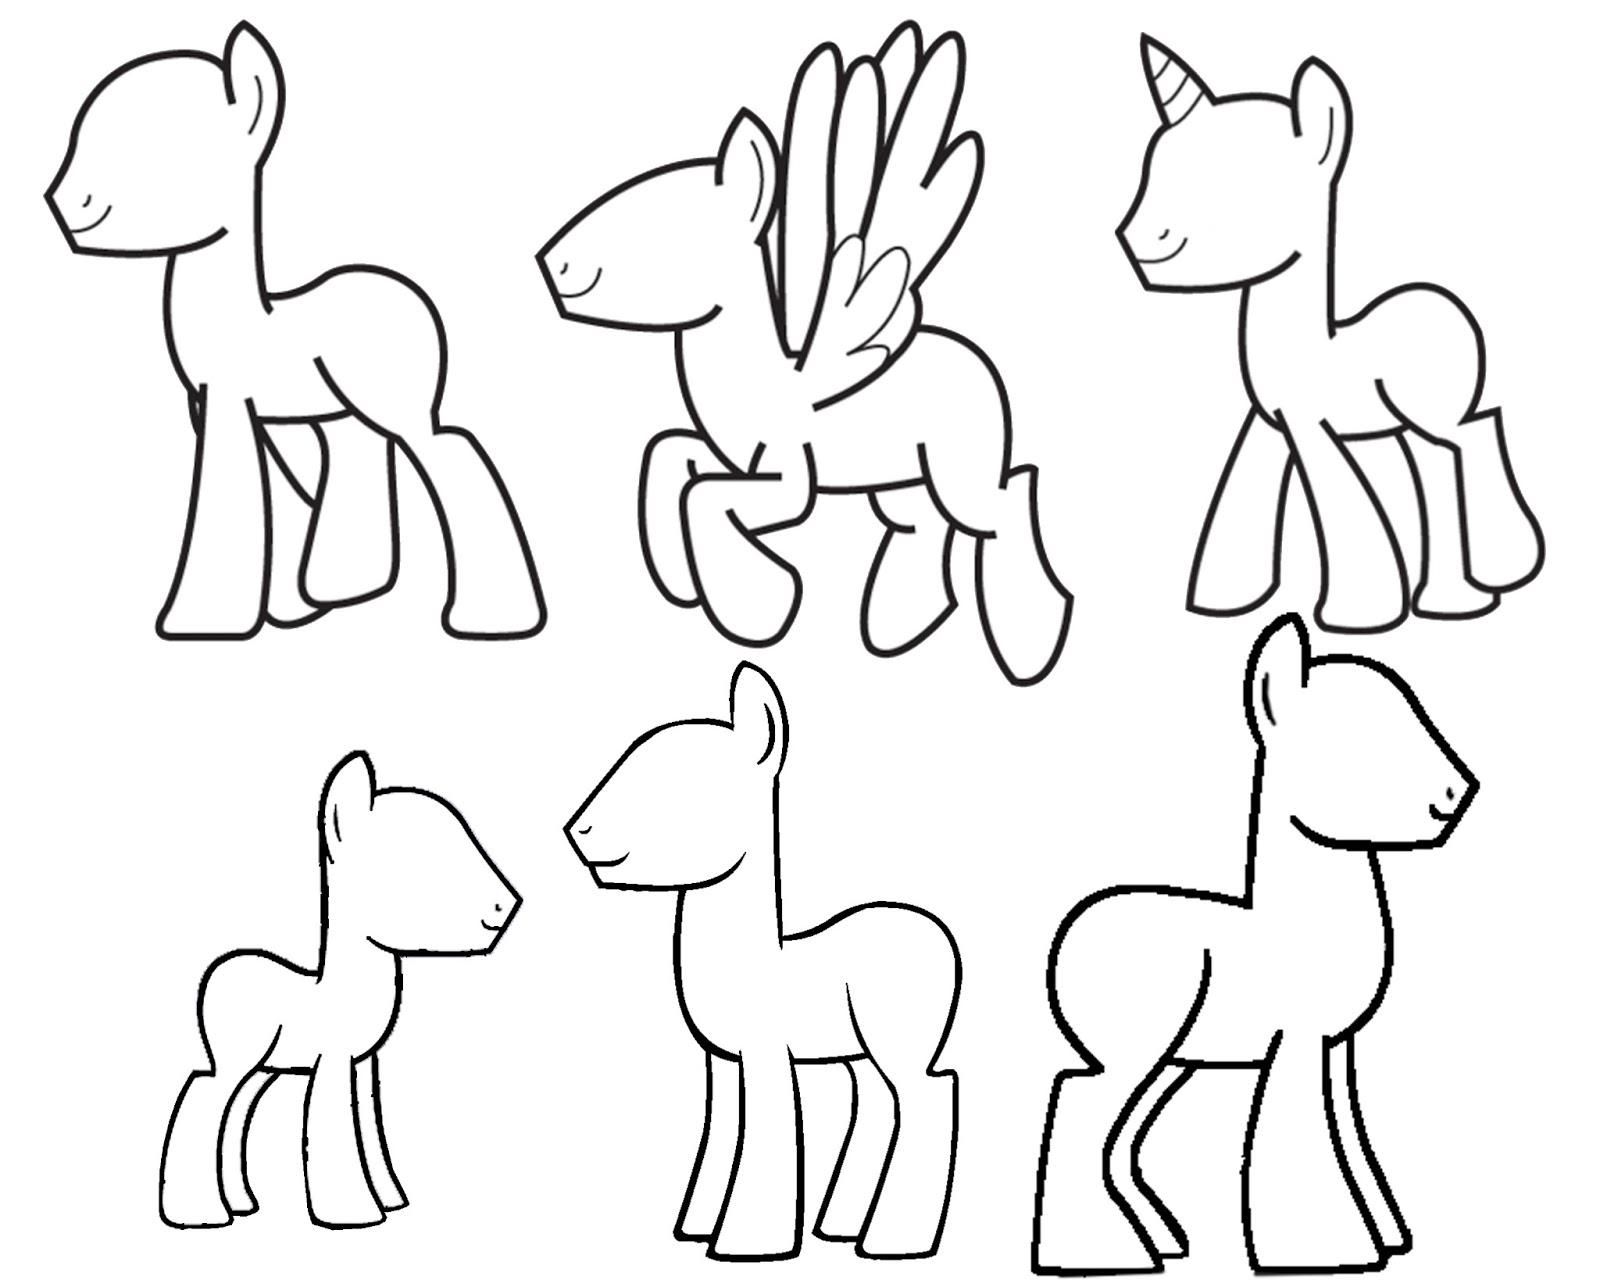 1600x1280 How To Draw My Little Pony Friendship Is Magic Basic Body Shape